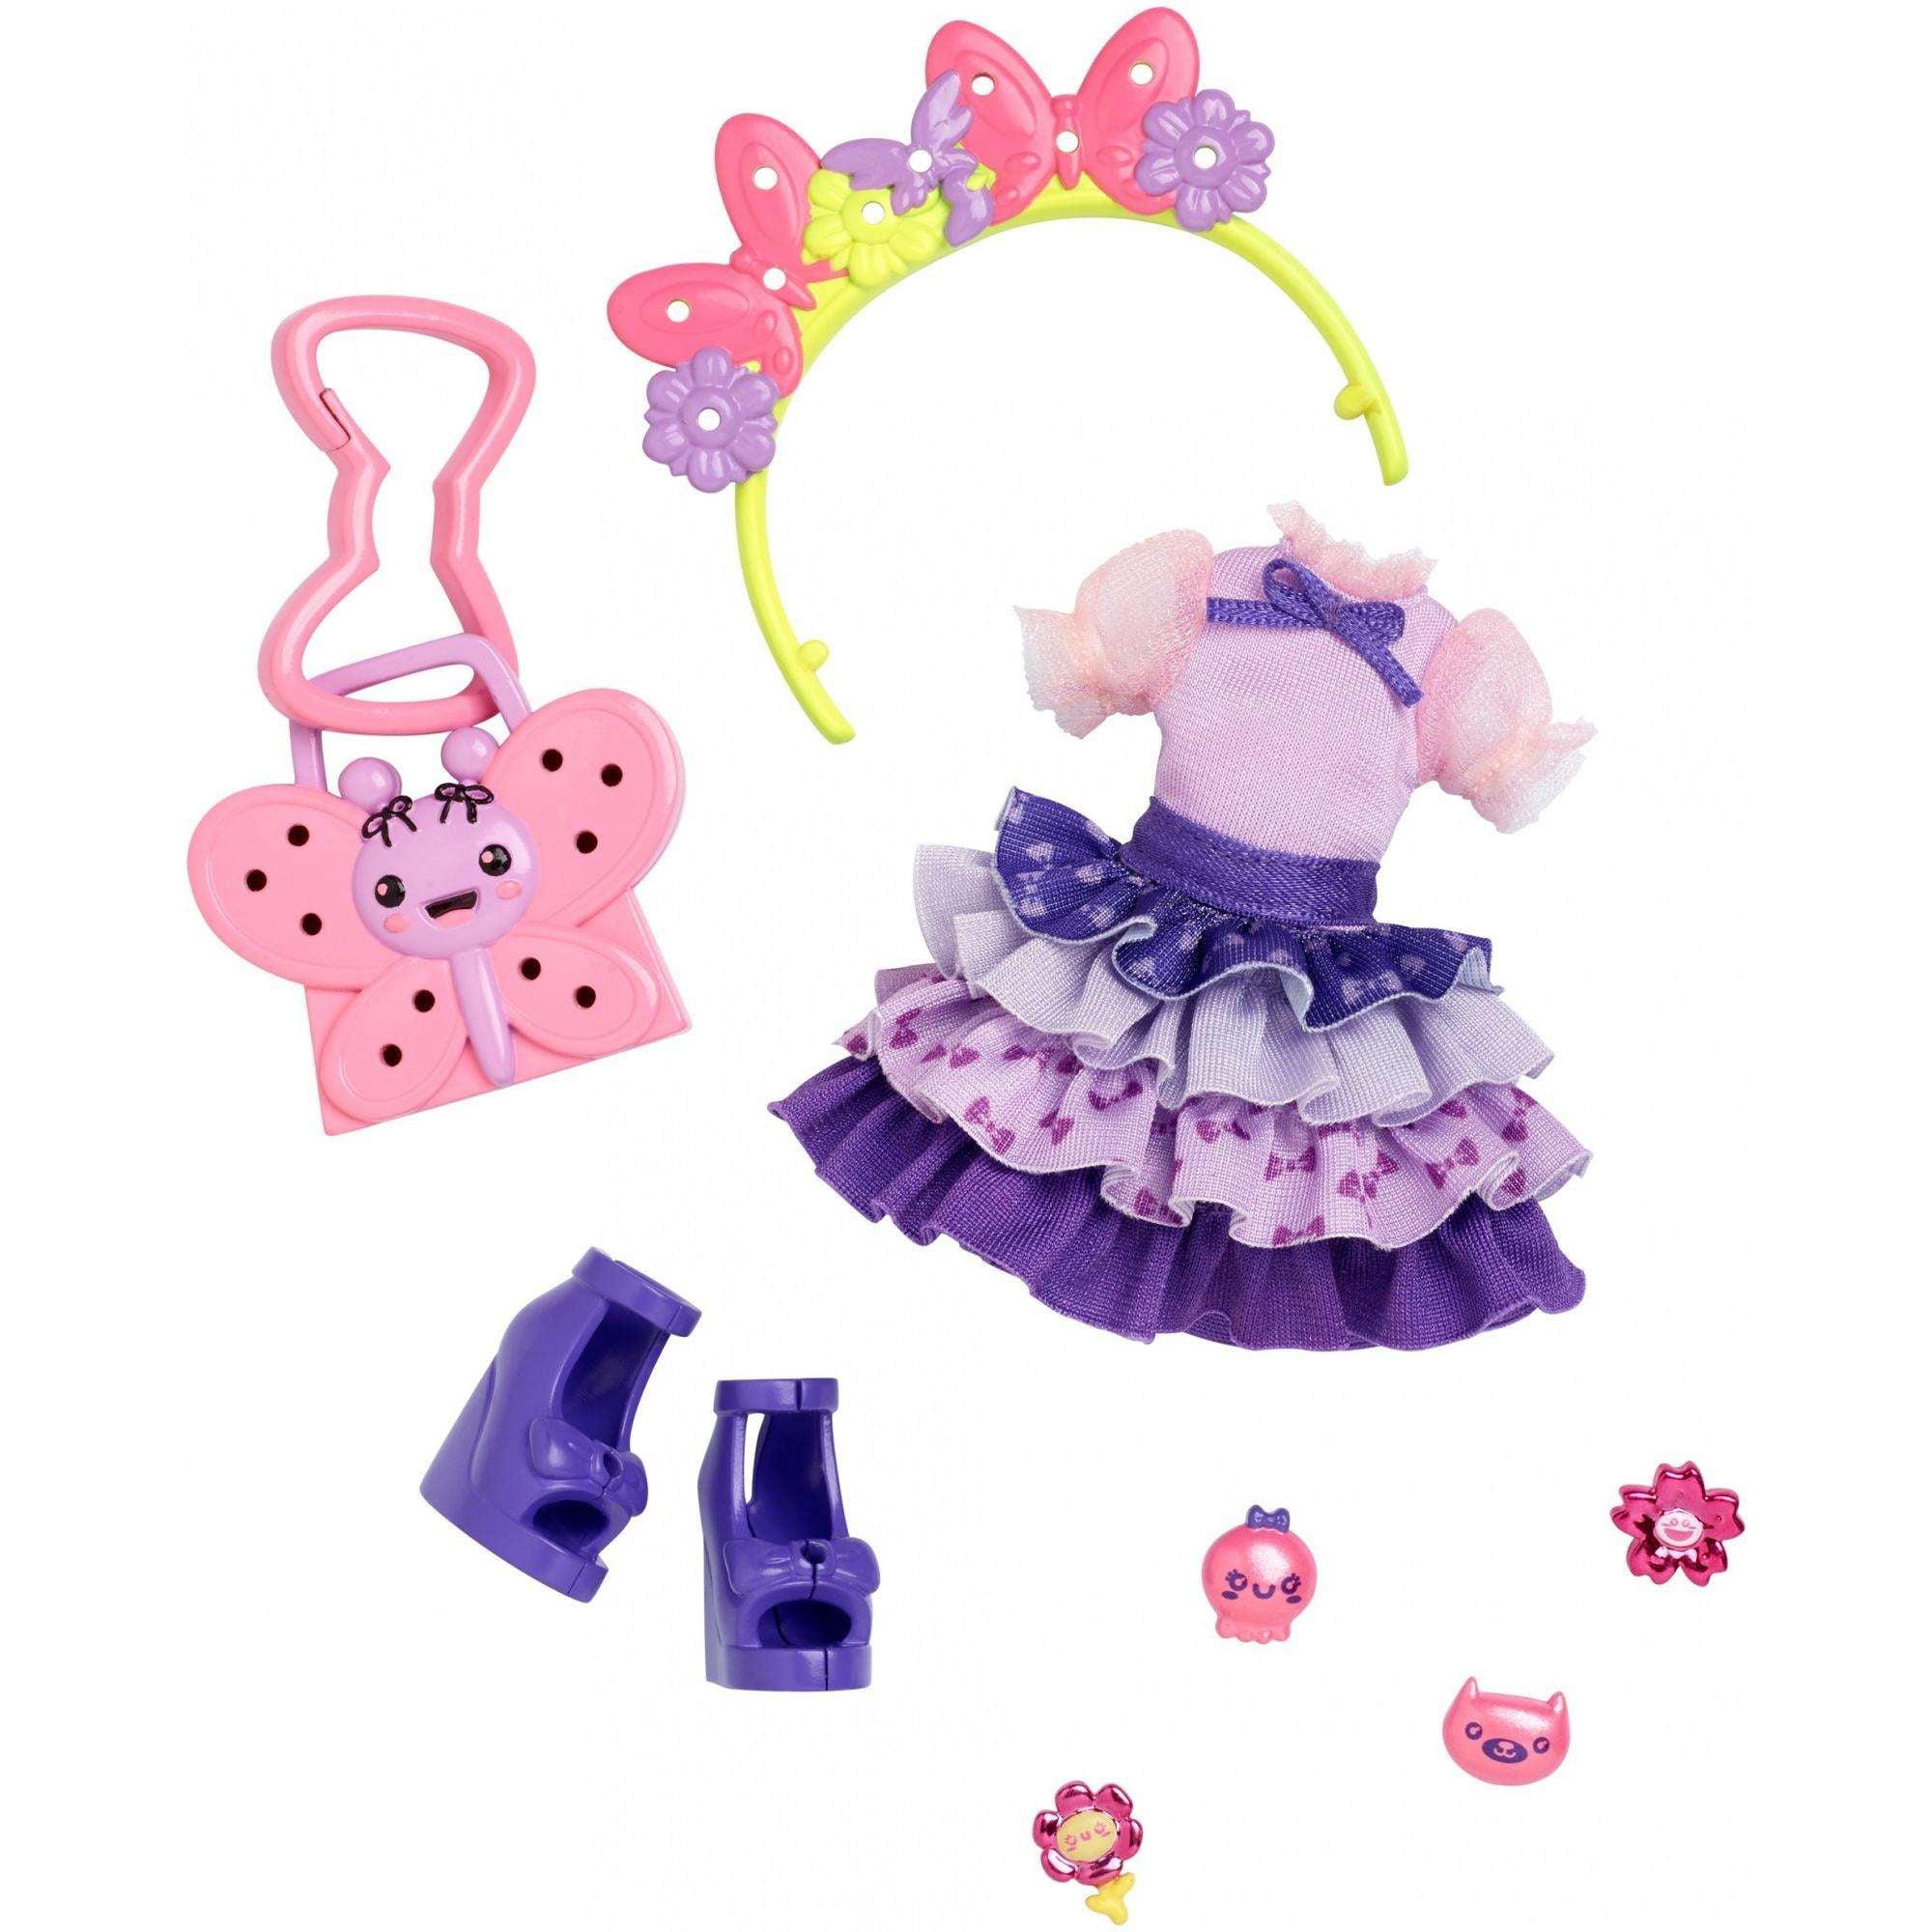 Kuu Kuu Harajuku Butterfly Blooms Fashion Pack